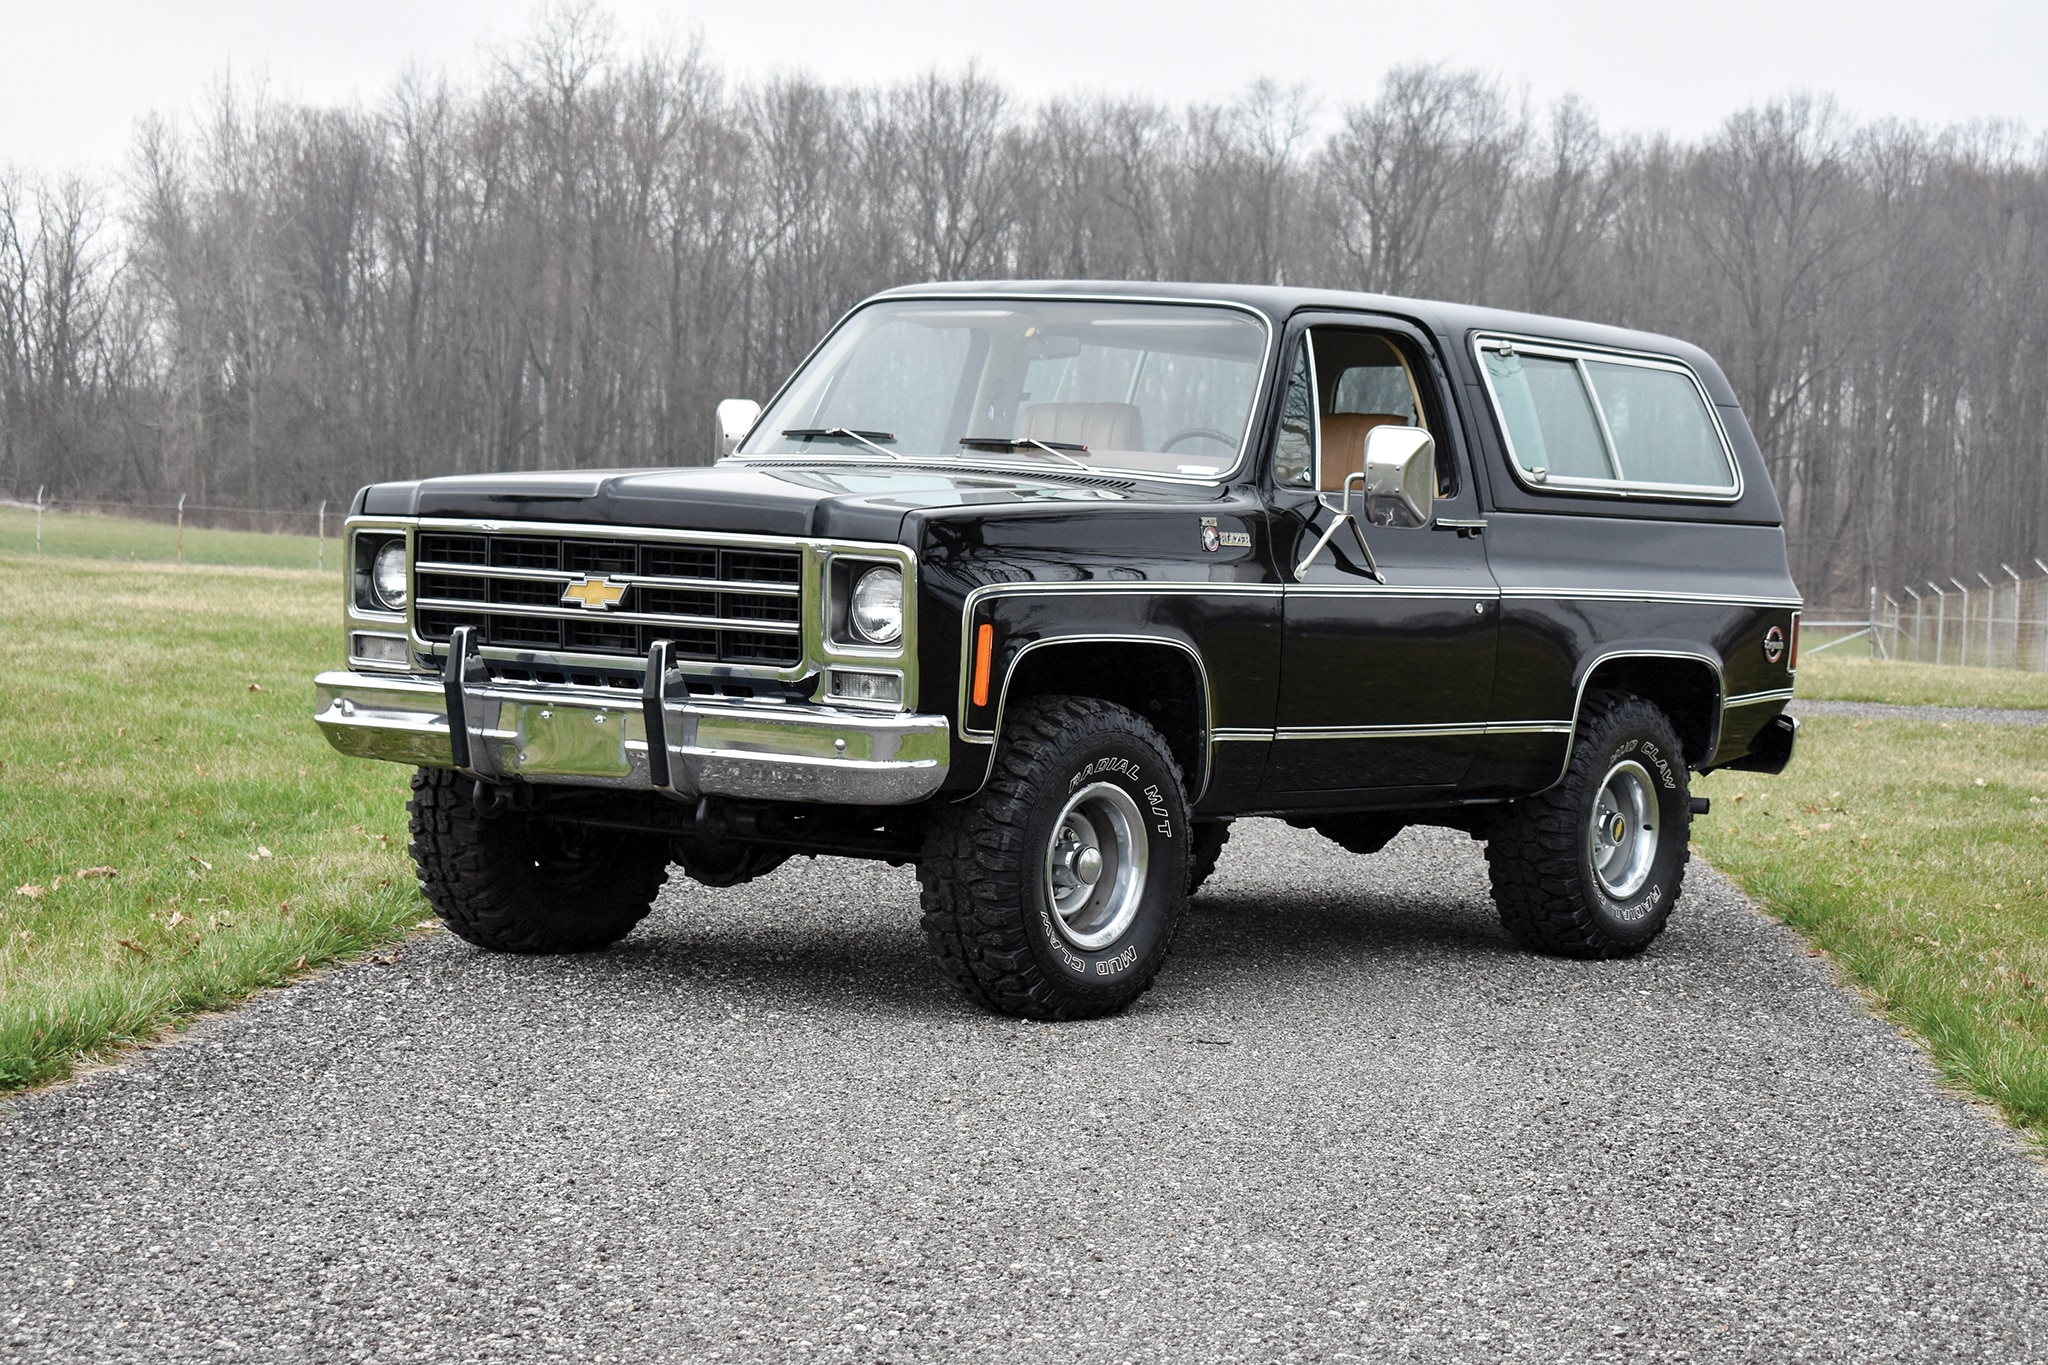 1979 Chevrolet K5 Blazer 1968 Ford Bronco RM Sothebys Auburn